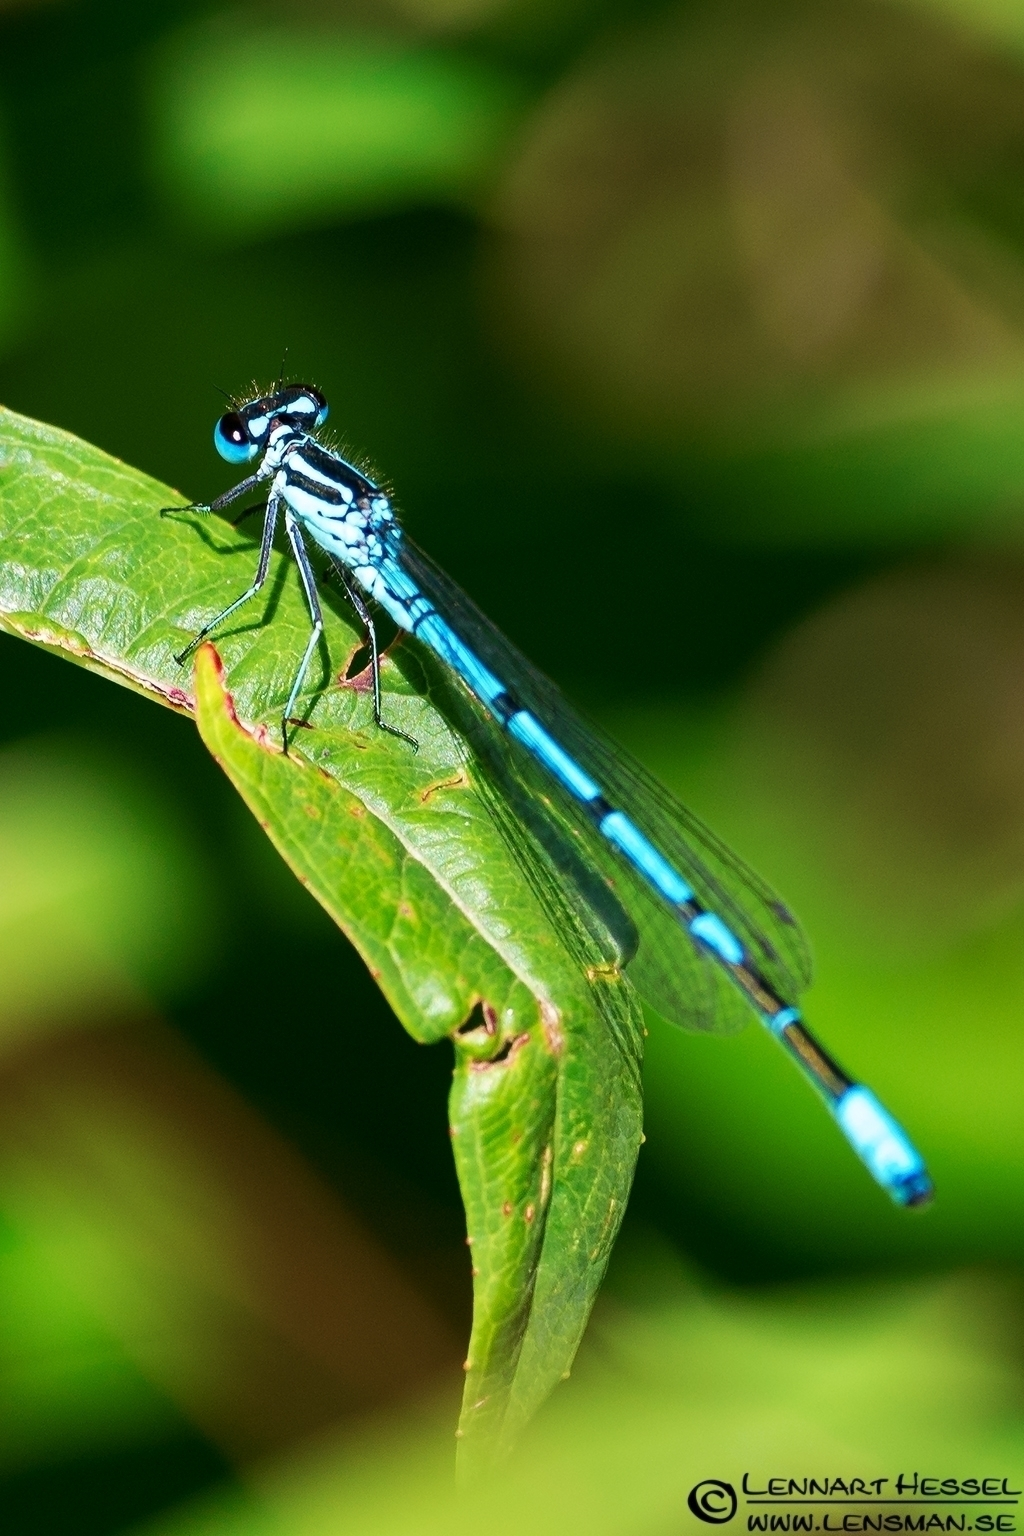 Blue Dragonfly, field trip